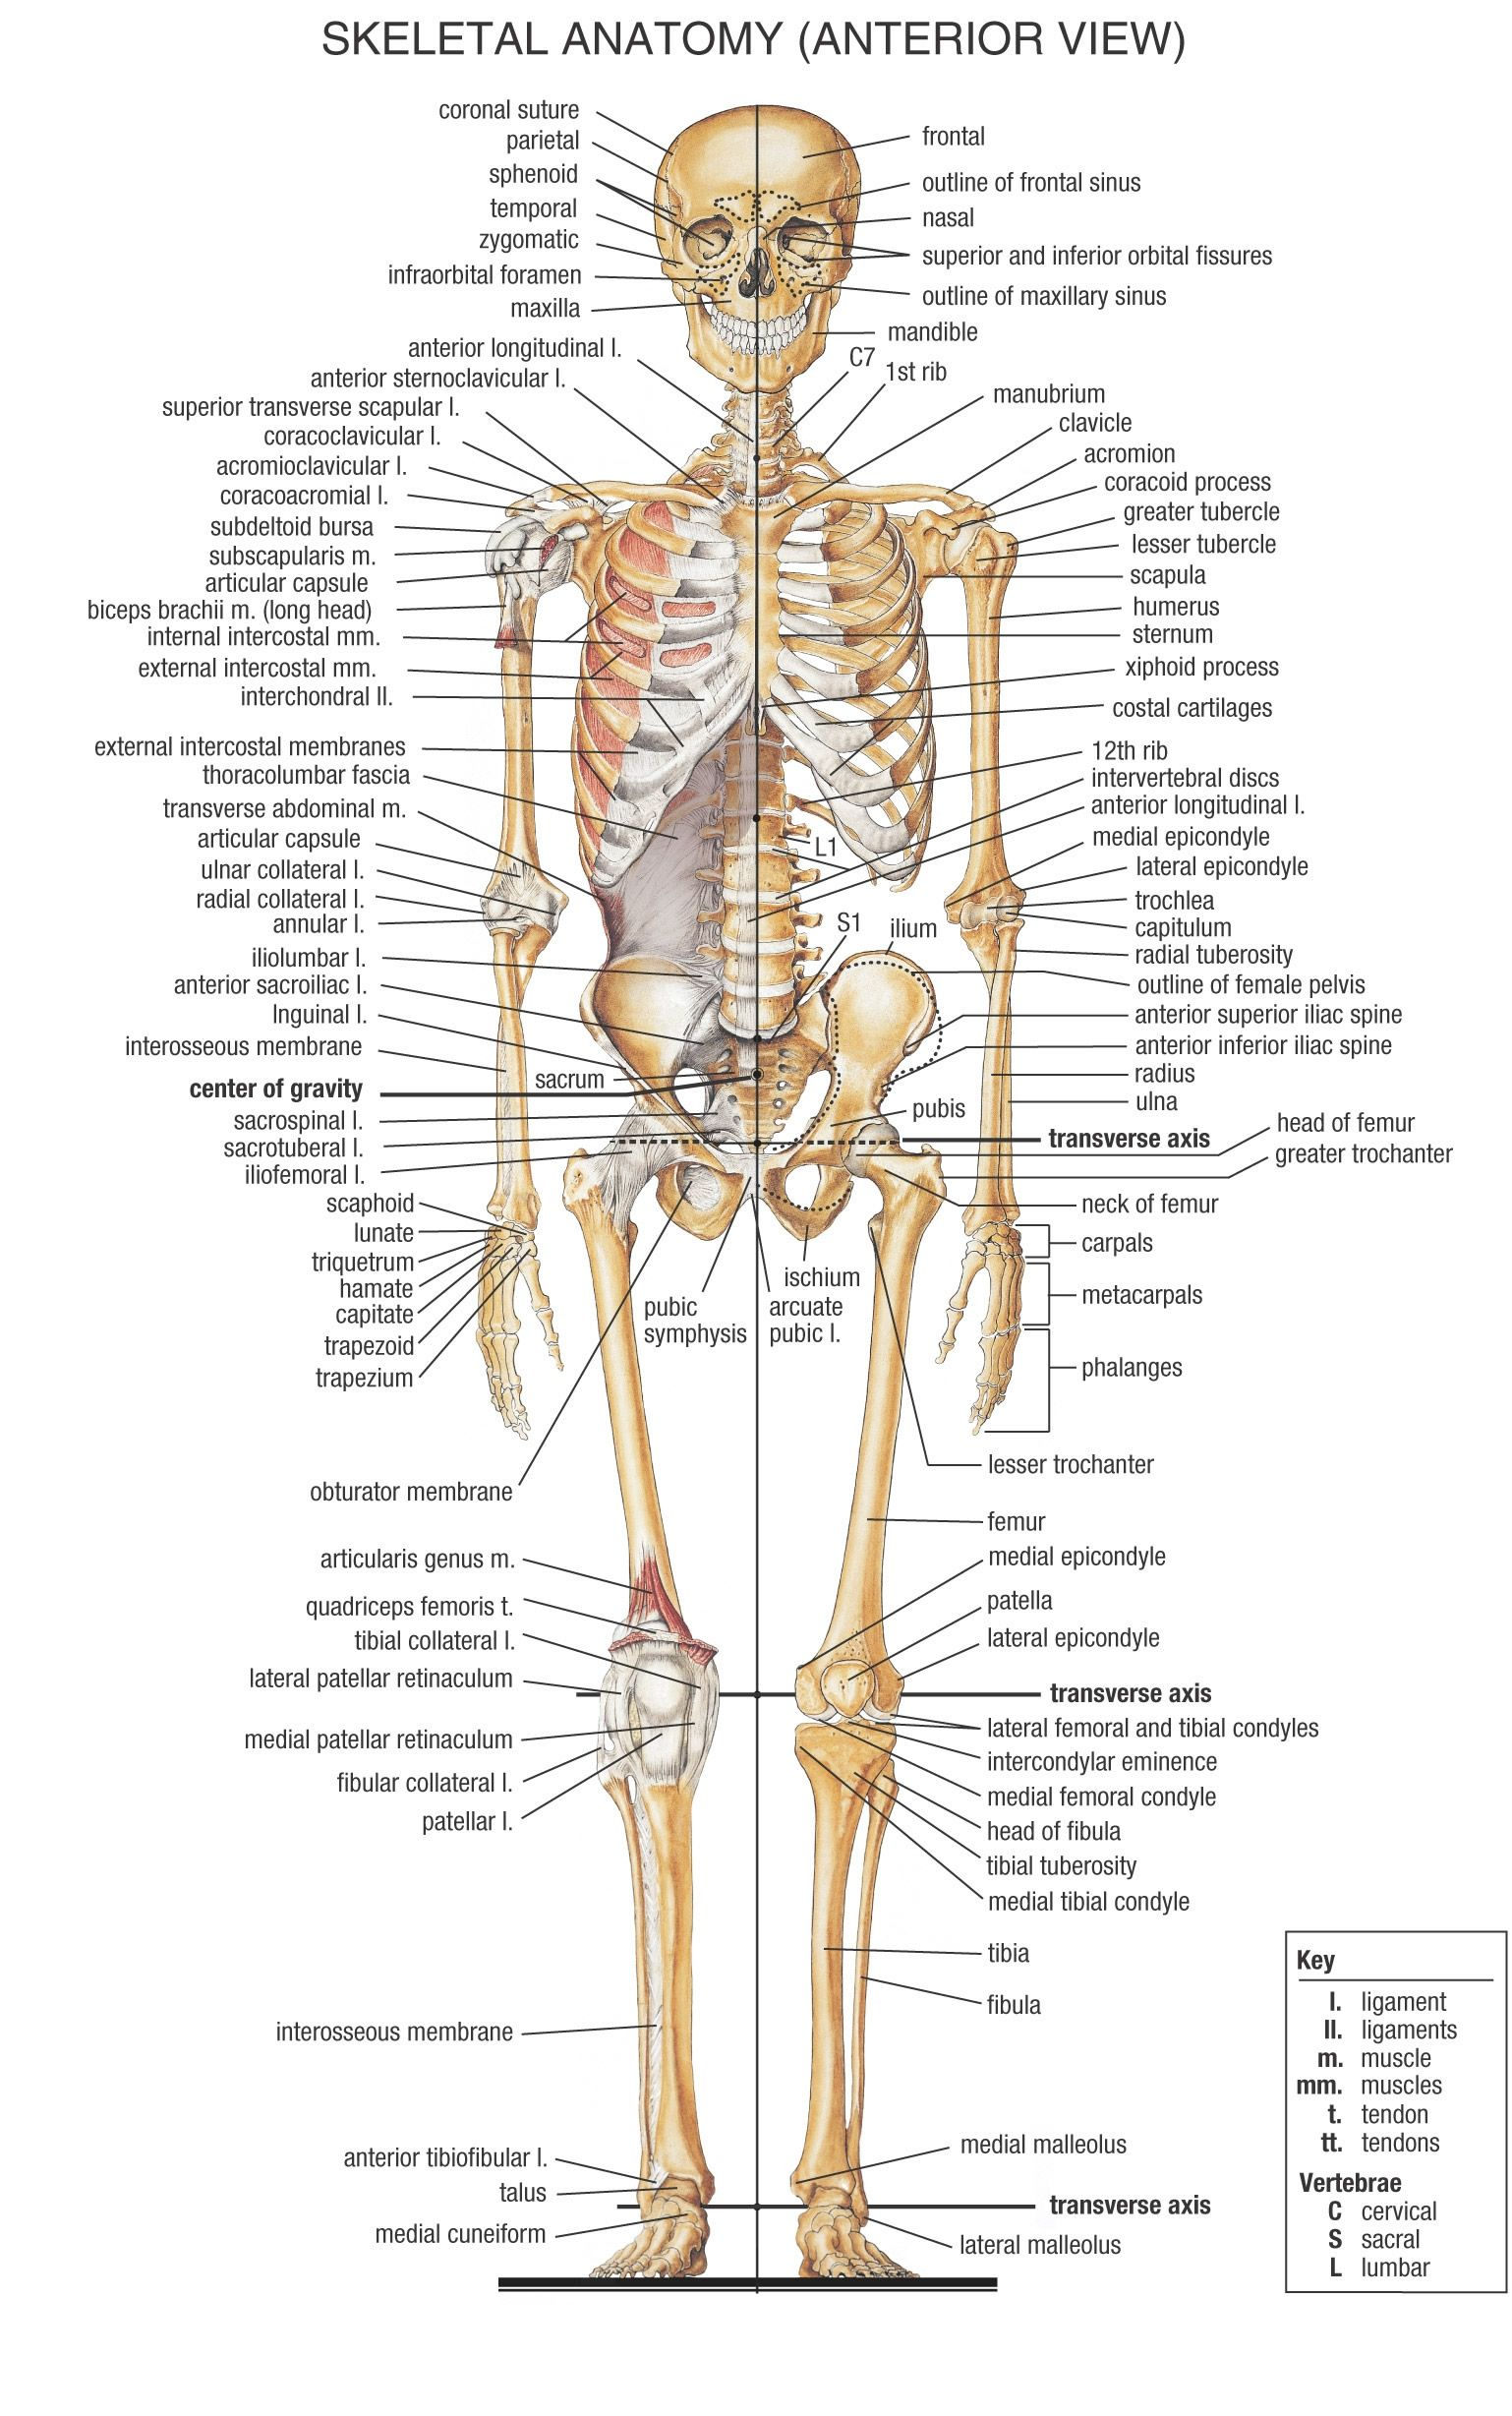 skeleton diagram of the entire body simple wiring diagrams skeletal system diagram to label detailed skeleton diagram [ 1538 x 2457 Pixel ]